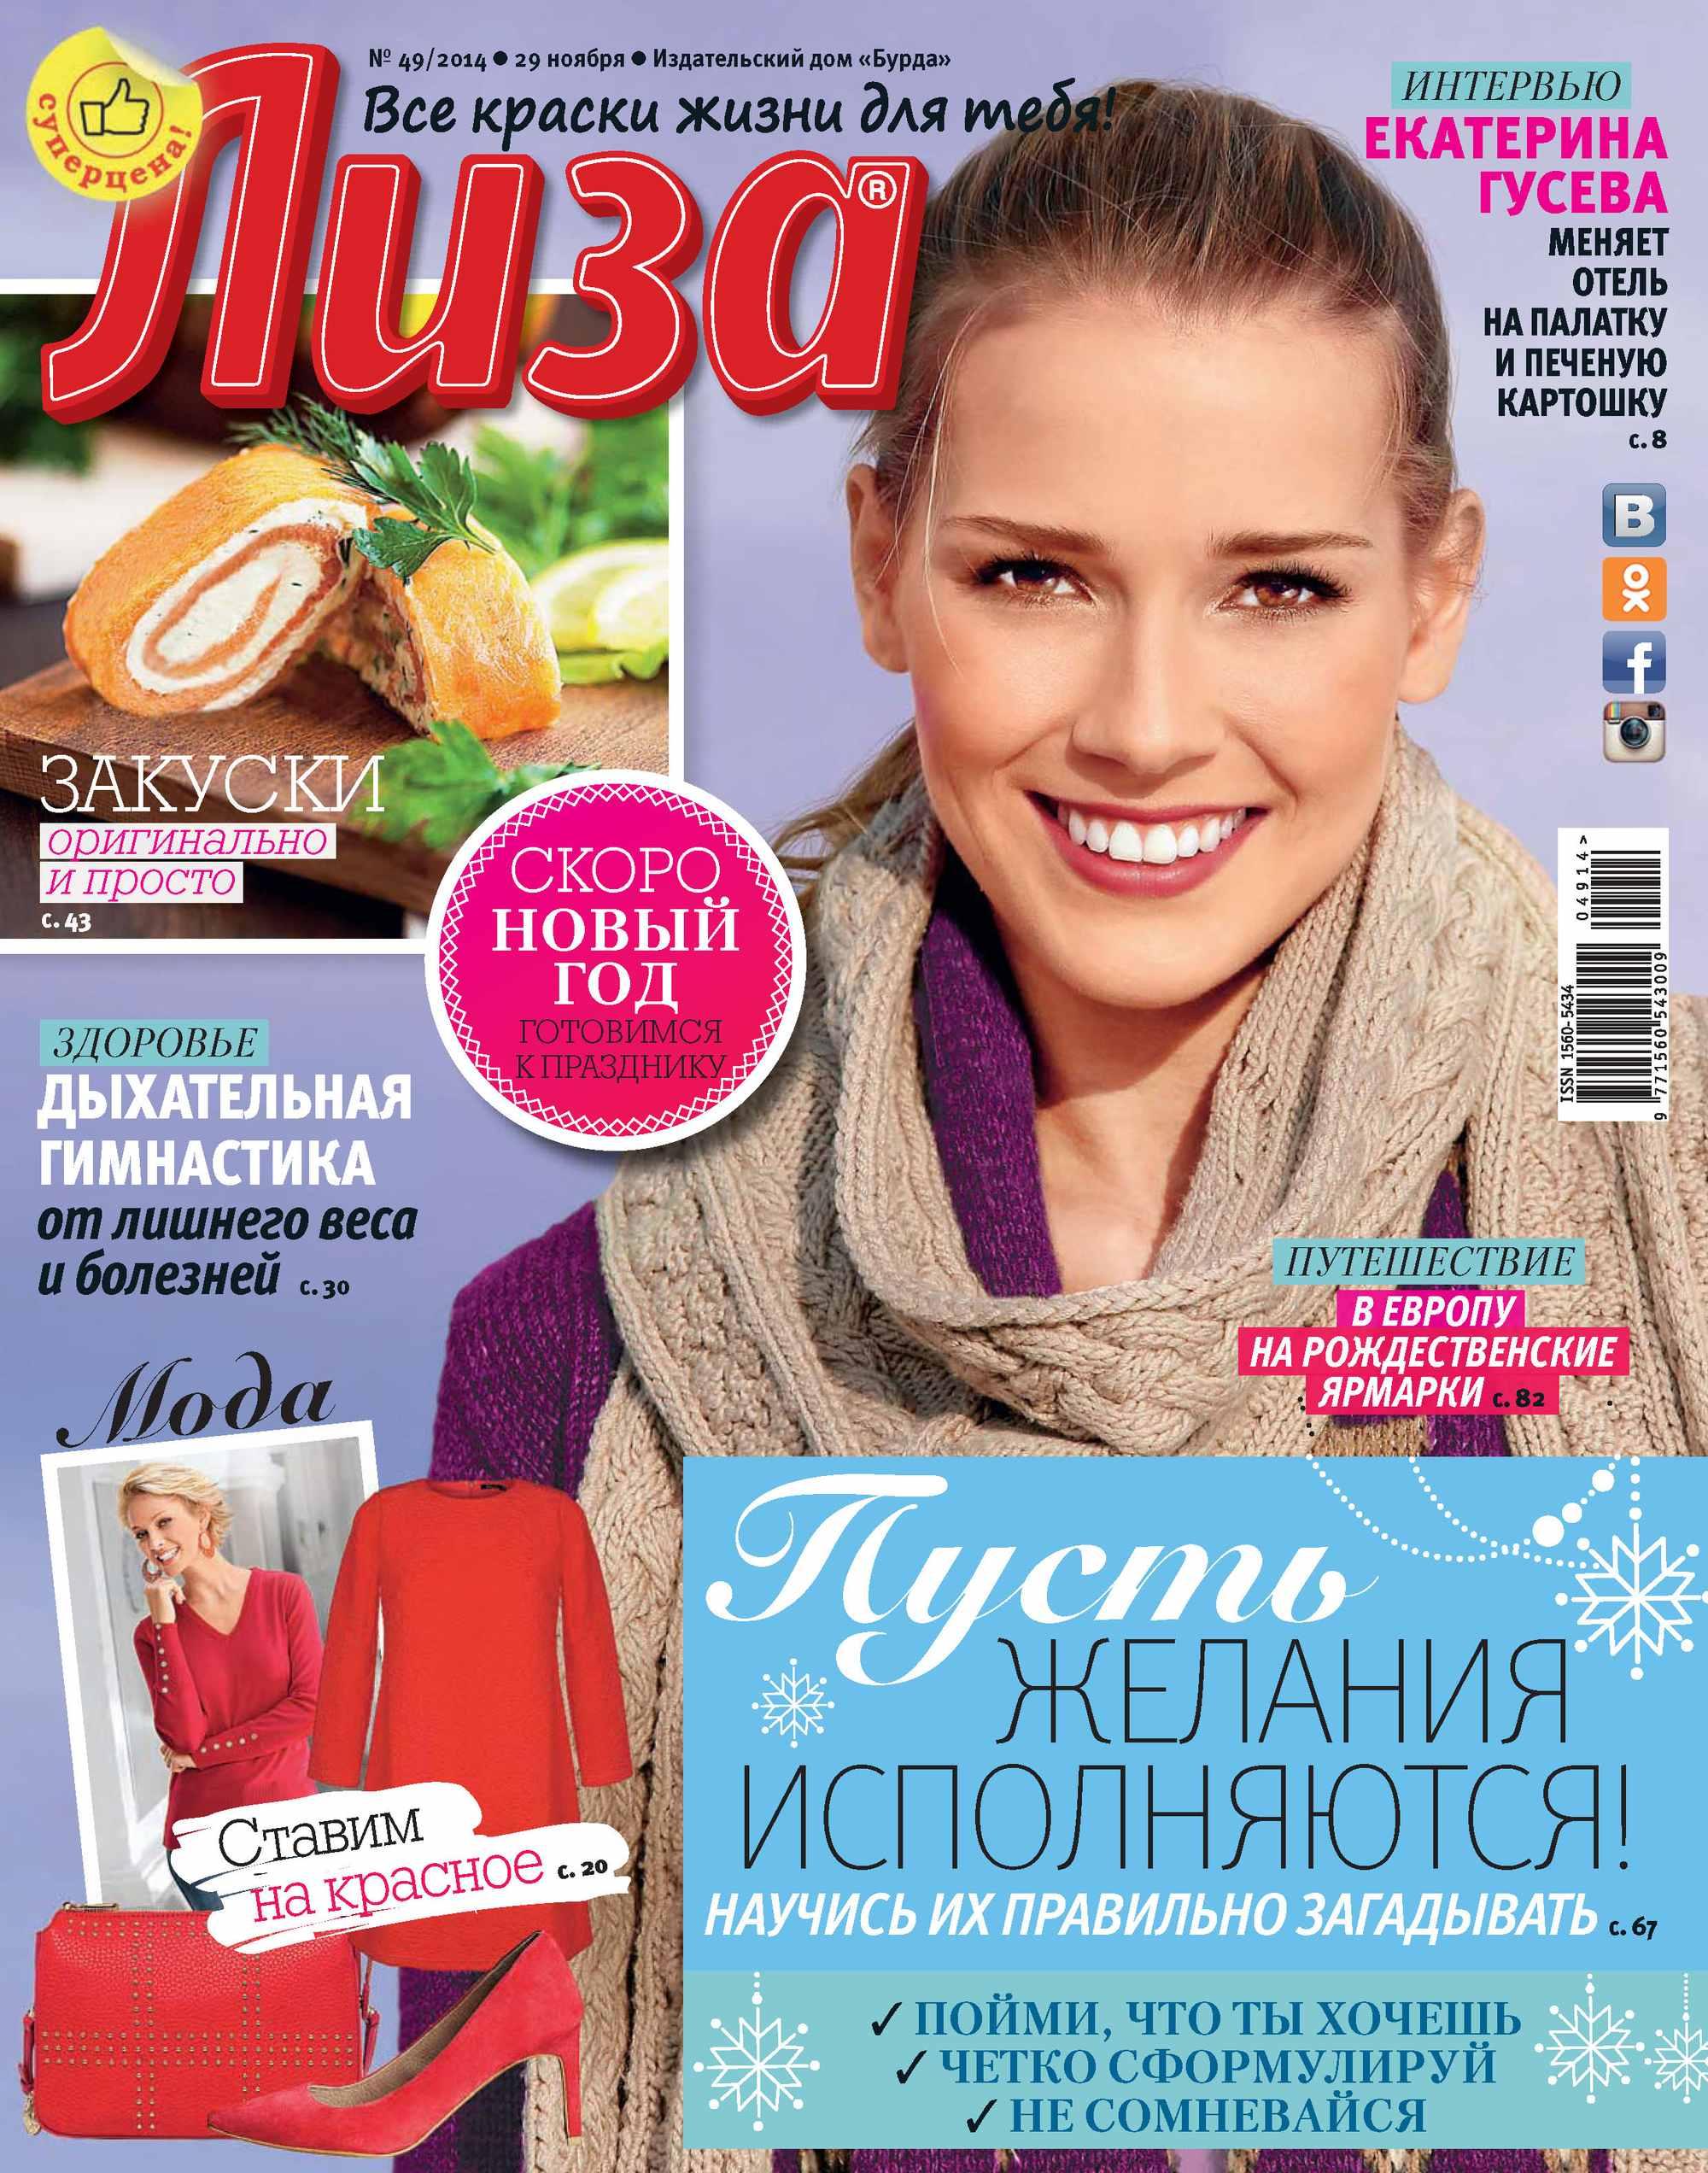 ИД «Бурда» Журнал «Лиза» №49/2014 ид бурда журнал лиза 38 2014